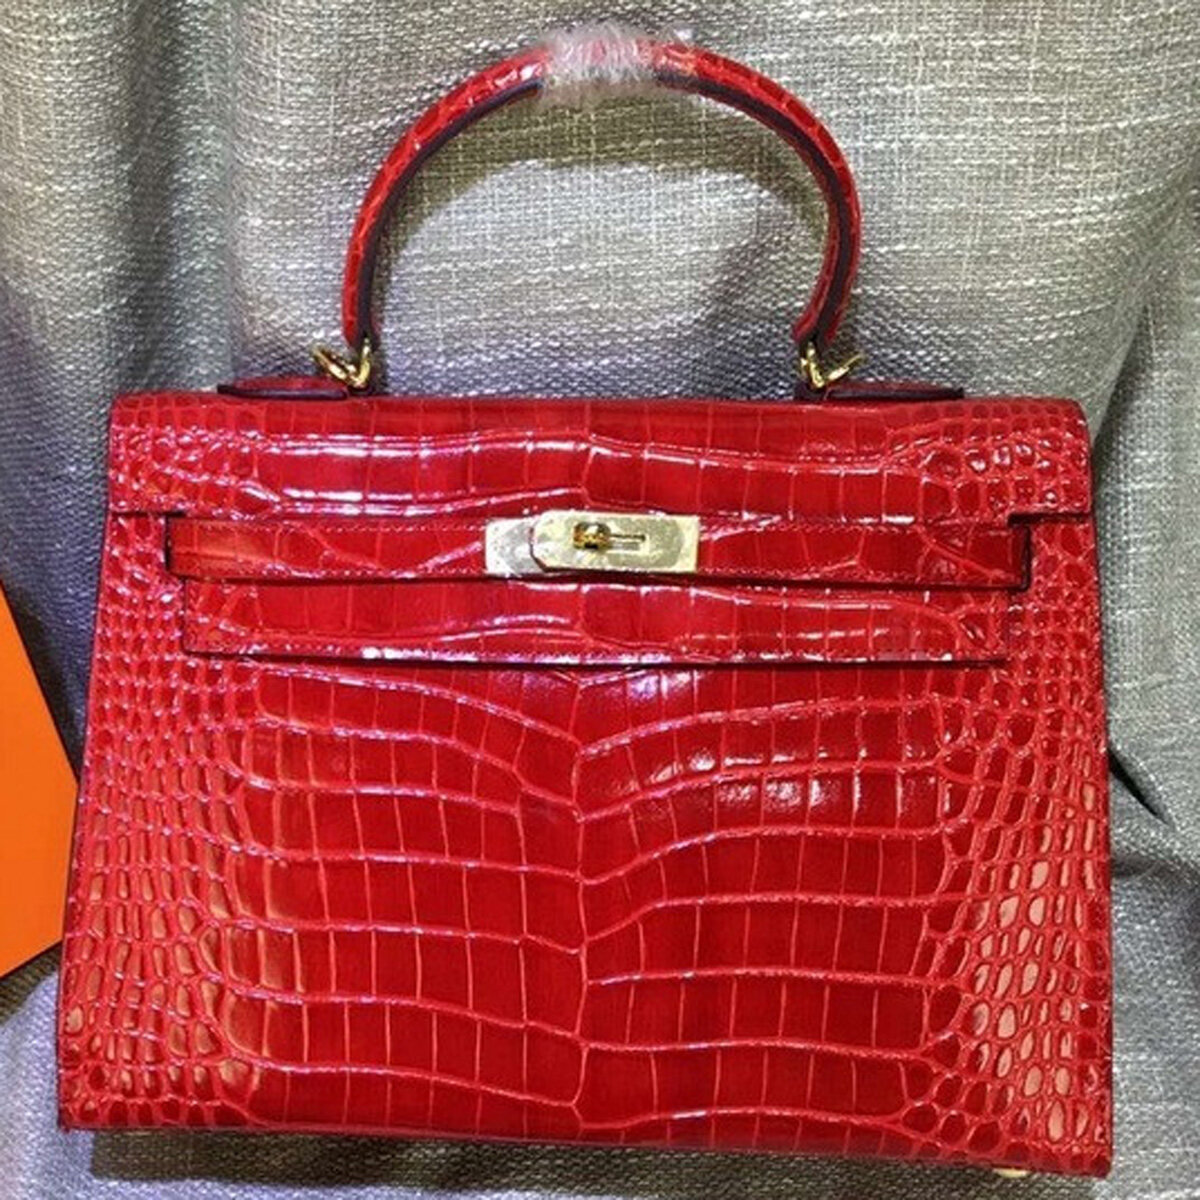 d0a734aa59aa Hermes Kelly Handbag Cross Body Bag Crocodile Leather Golden Hardware  28 32cm Red